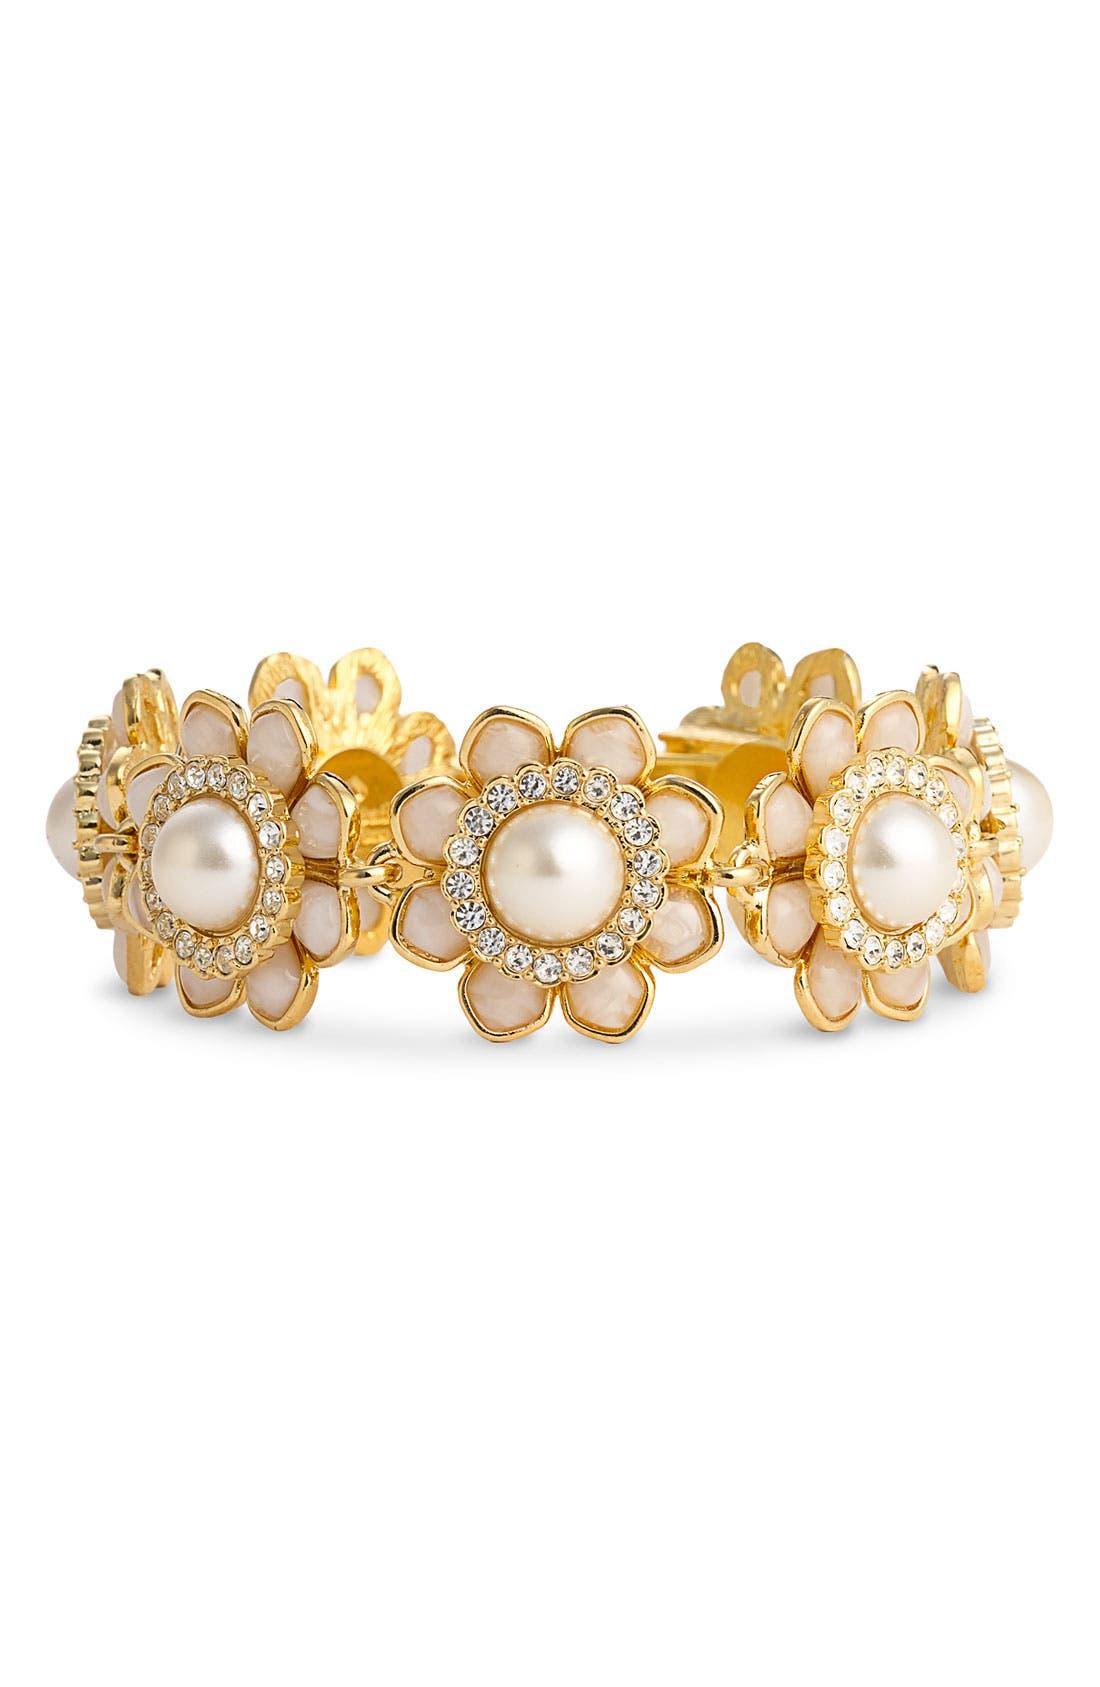 Alternate Image 1 Selected - kate spade new york 'sweet zinnia' floral line bracelet